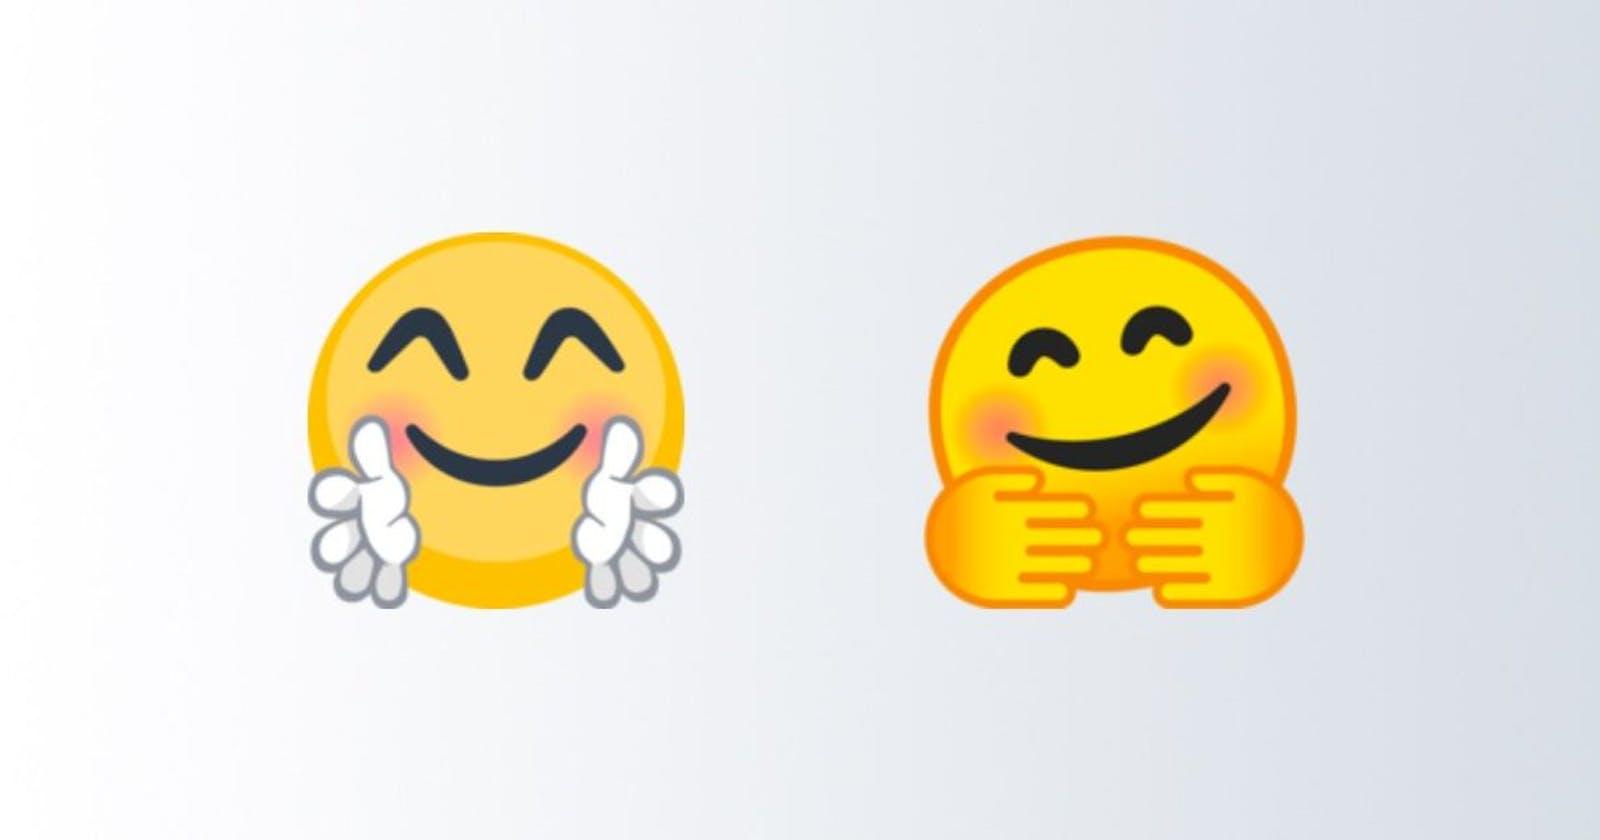 3 JavaScript array methods with emojis!